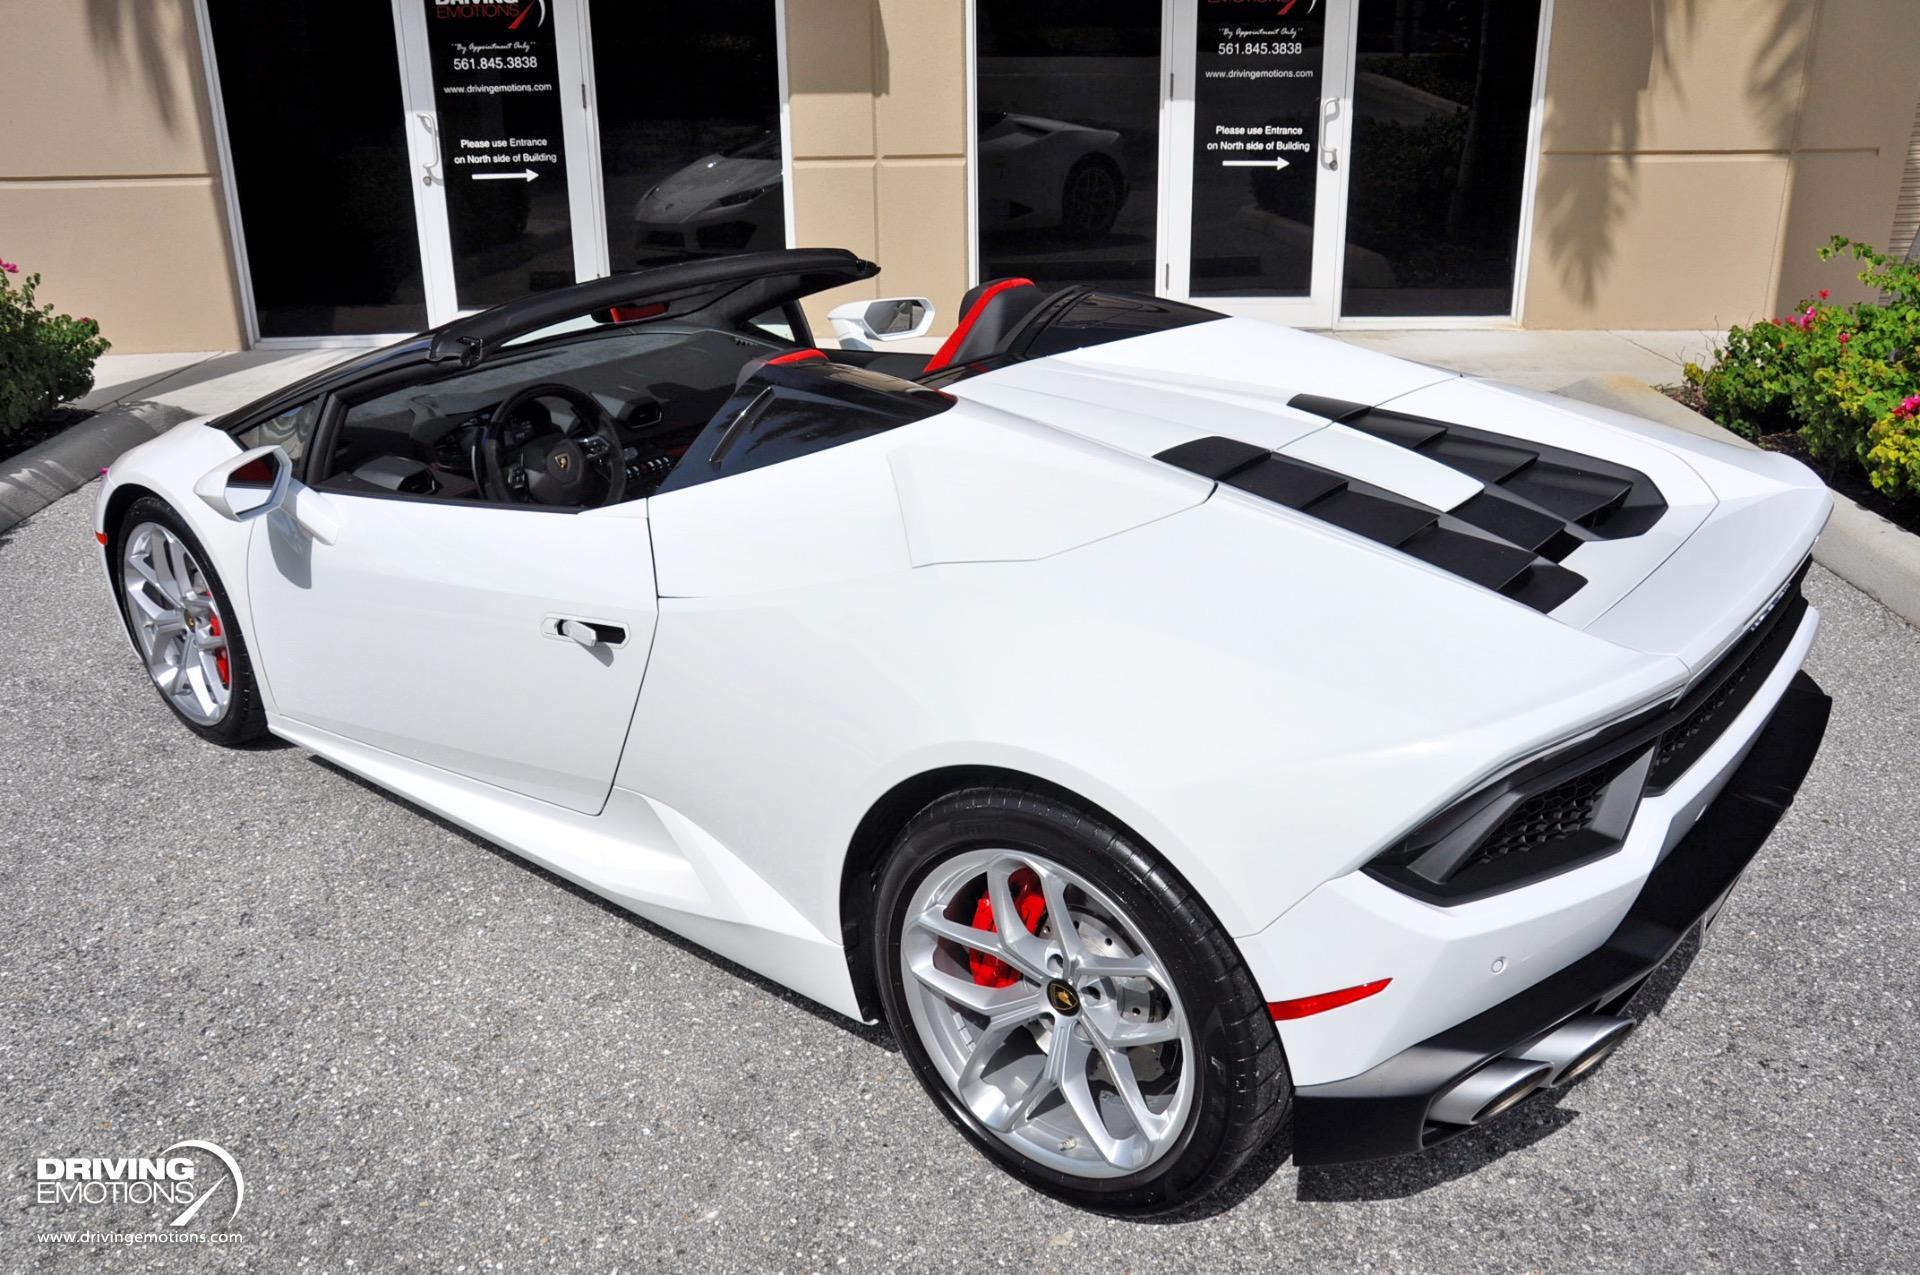 Used 2018 Lamborghini Huracan LP580-2 Spyder LP 580-2 Spyder White/Red! Front Lift!!   Lake Park, FL